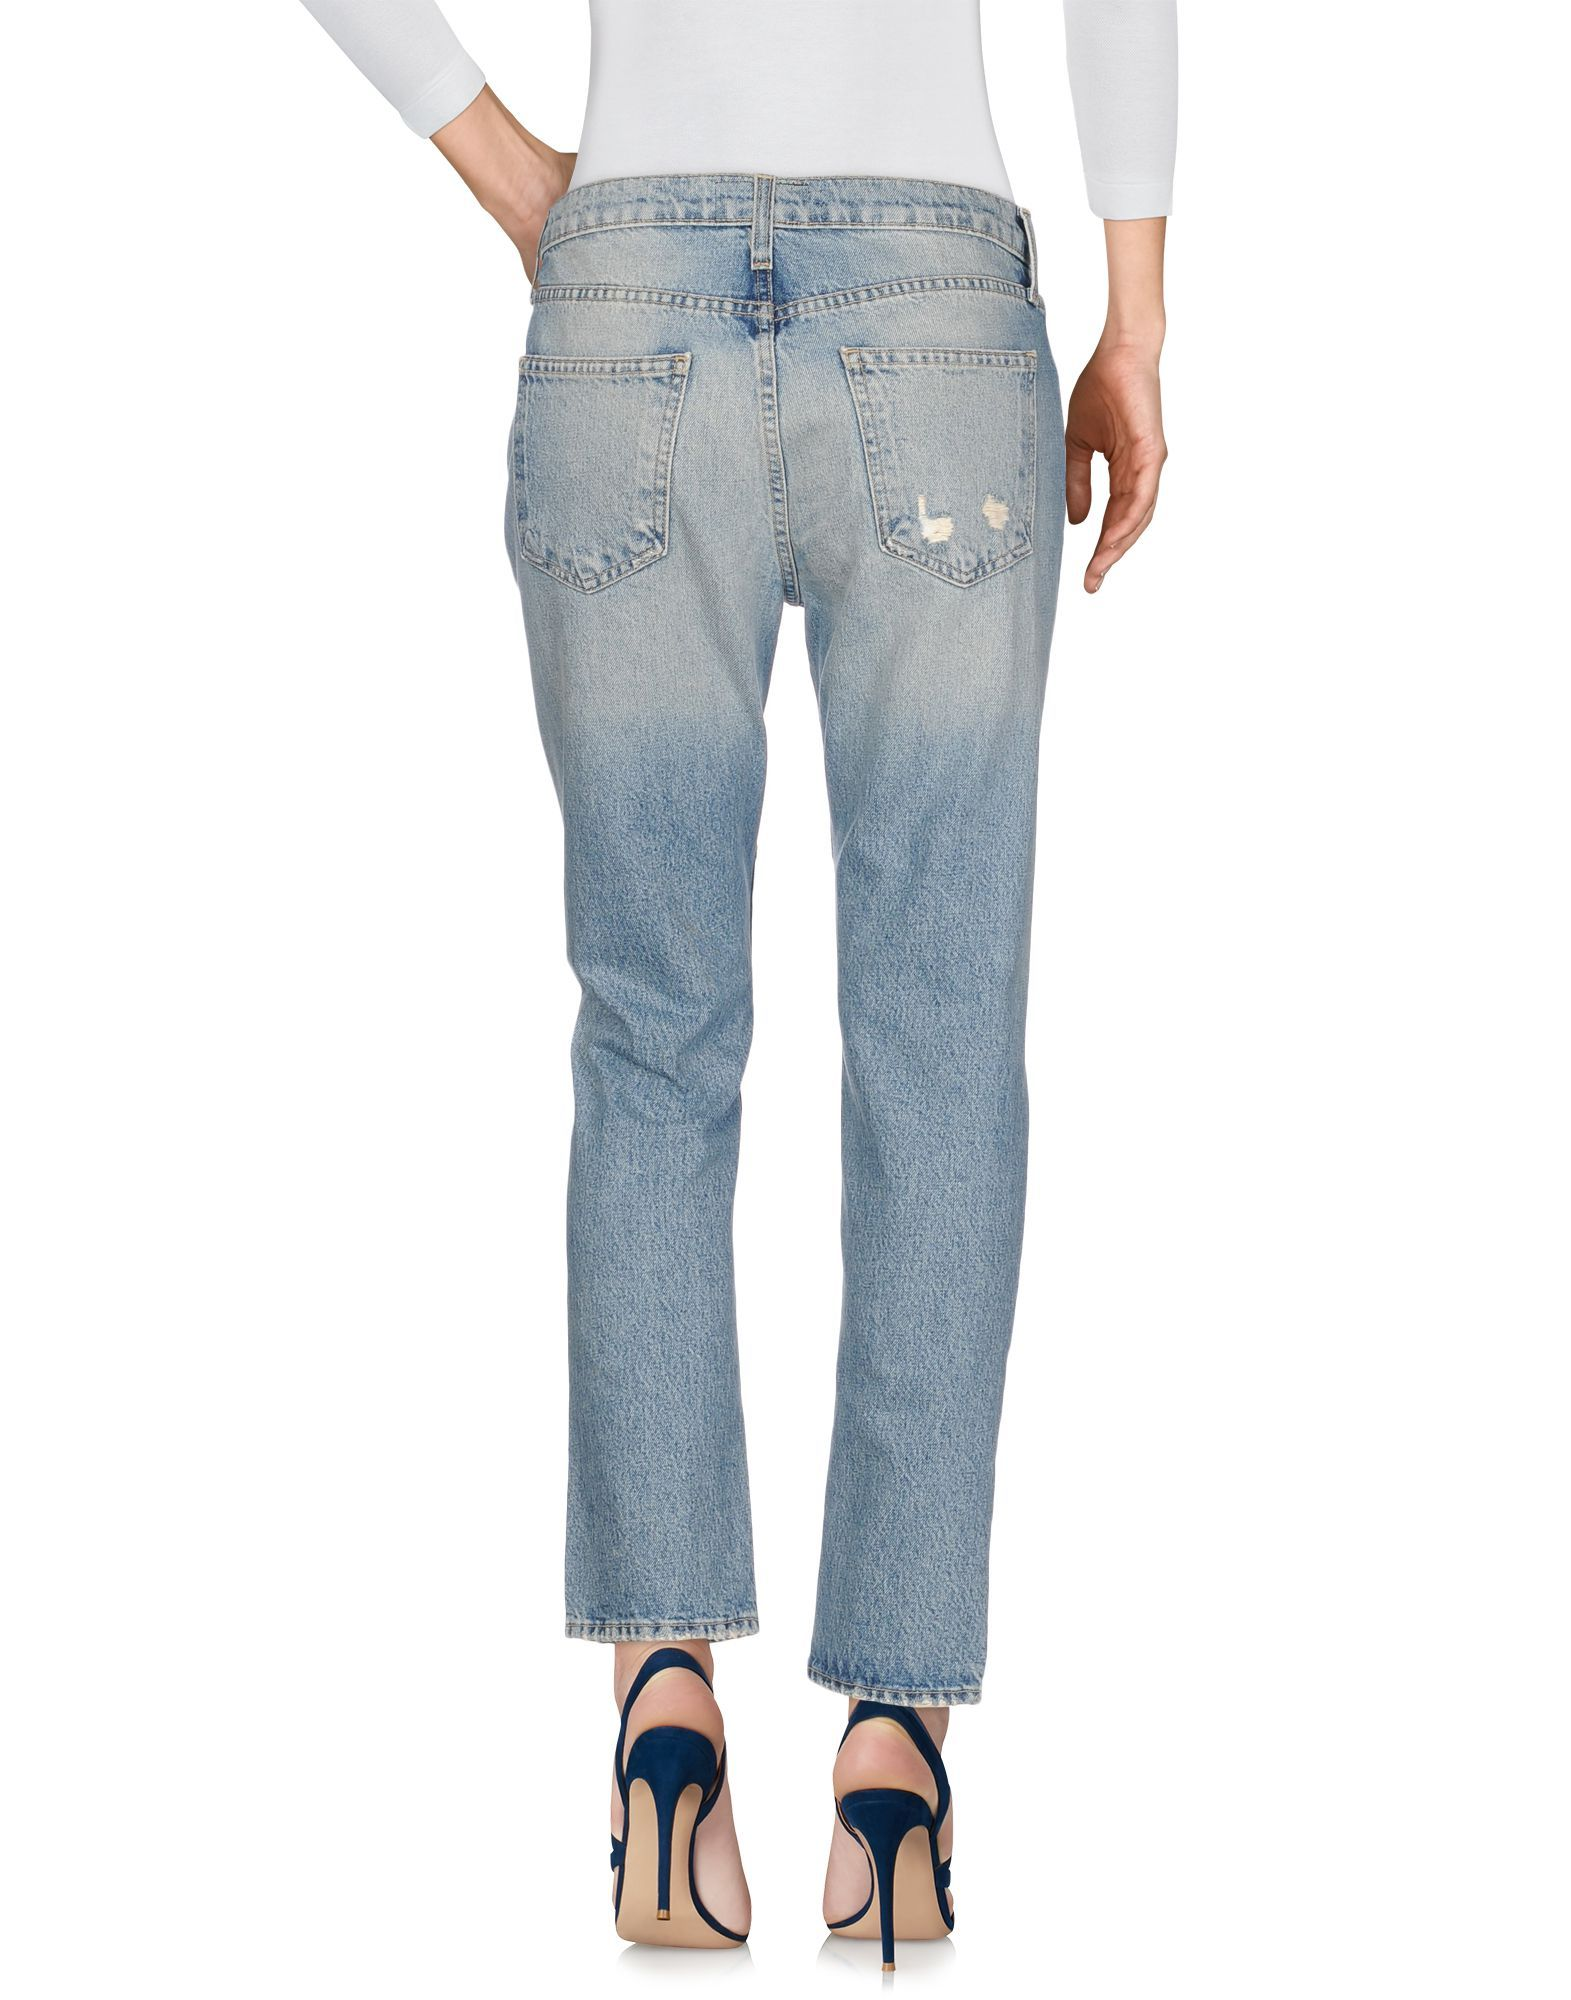 Current/Elliott Blue Distressed Cotton Jeans